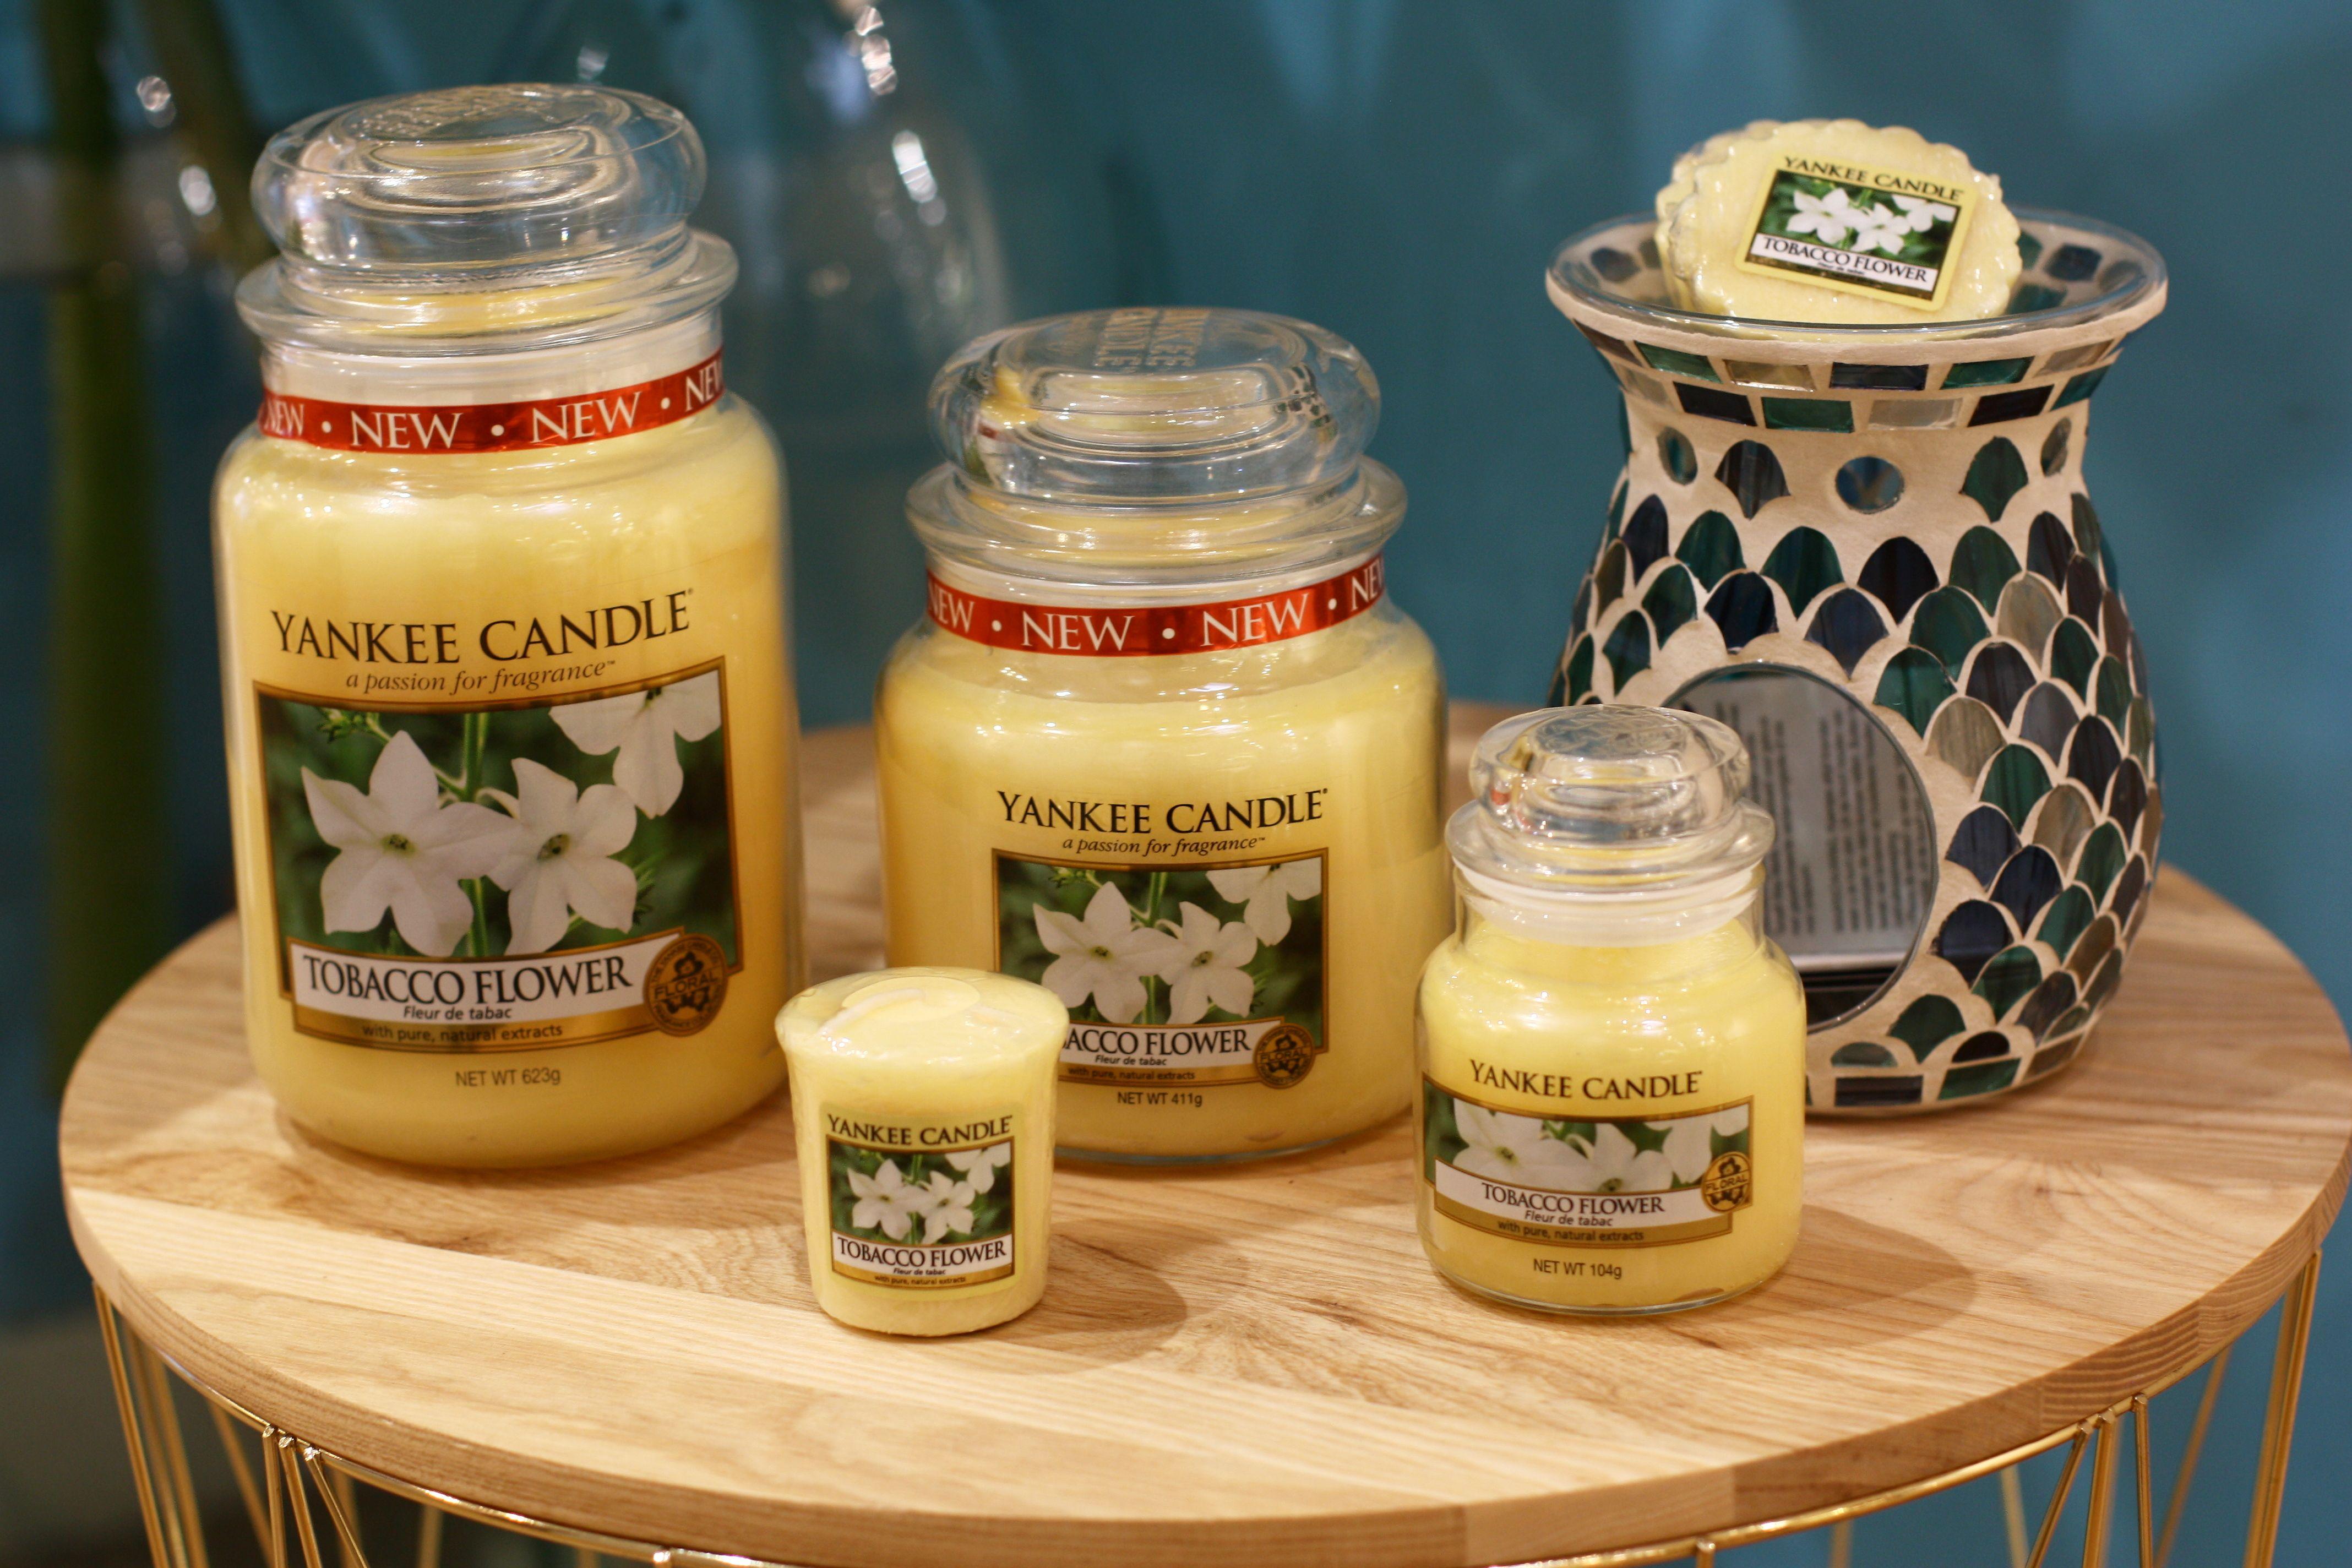 Fleur De Tabac Yankee Candle Une Bougie Parfumee Epicee Boisee